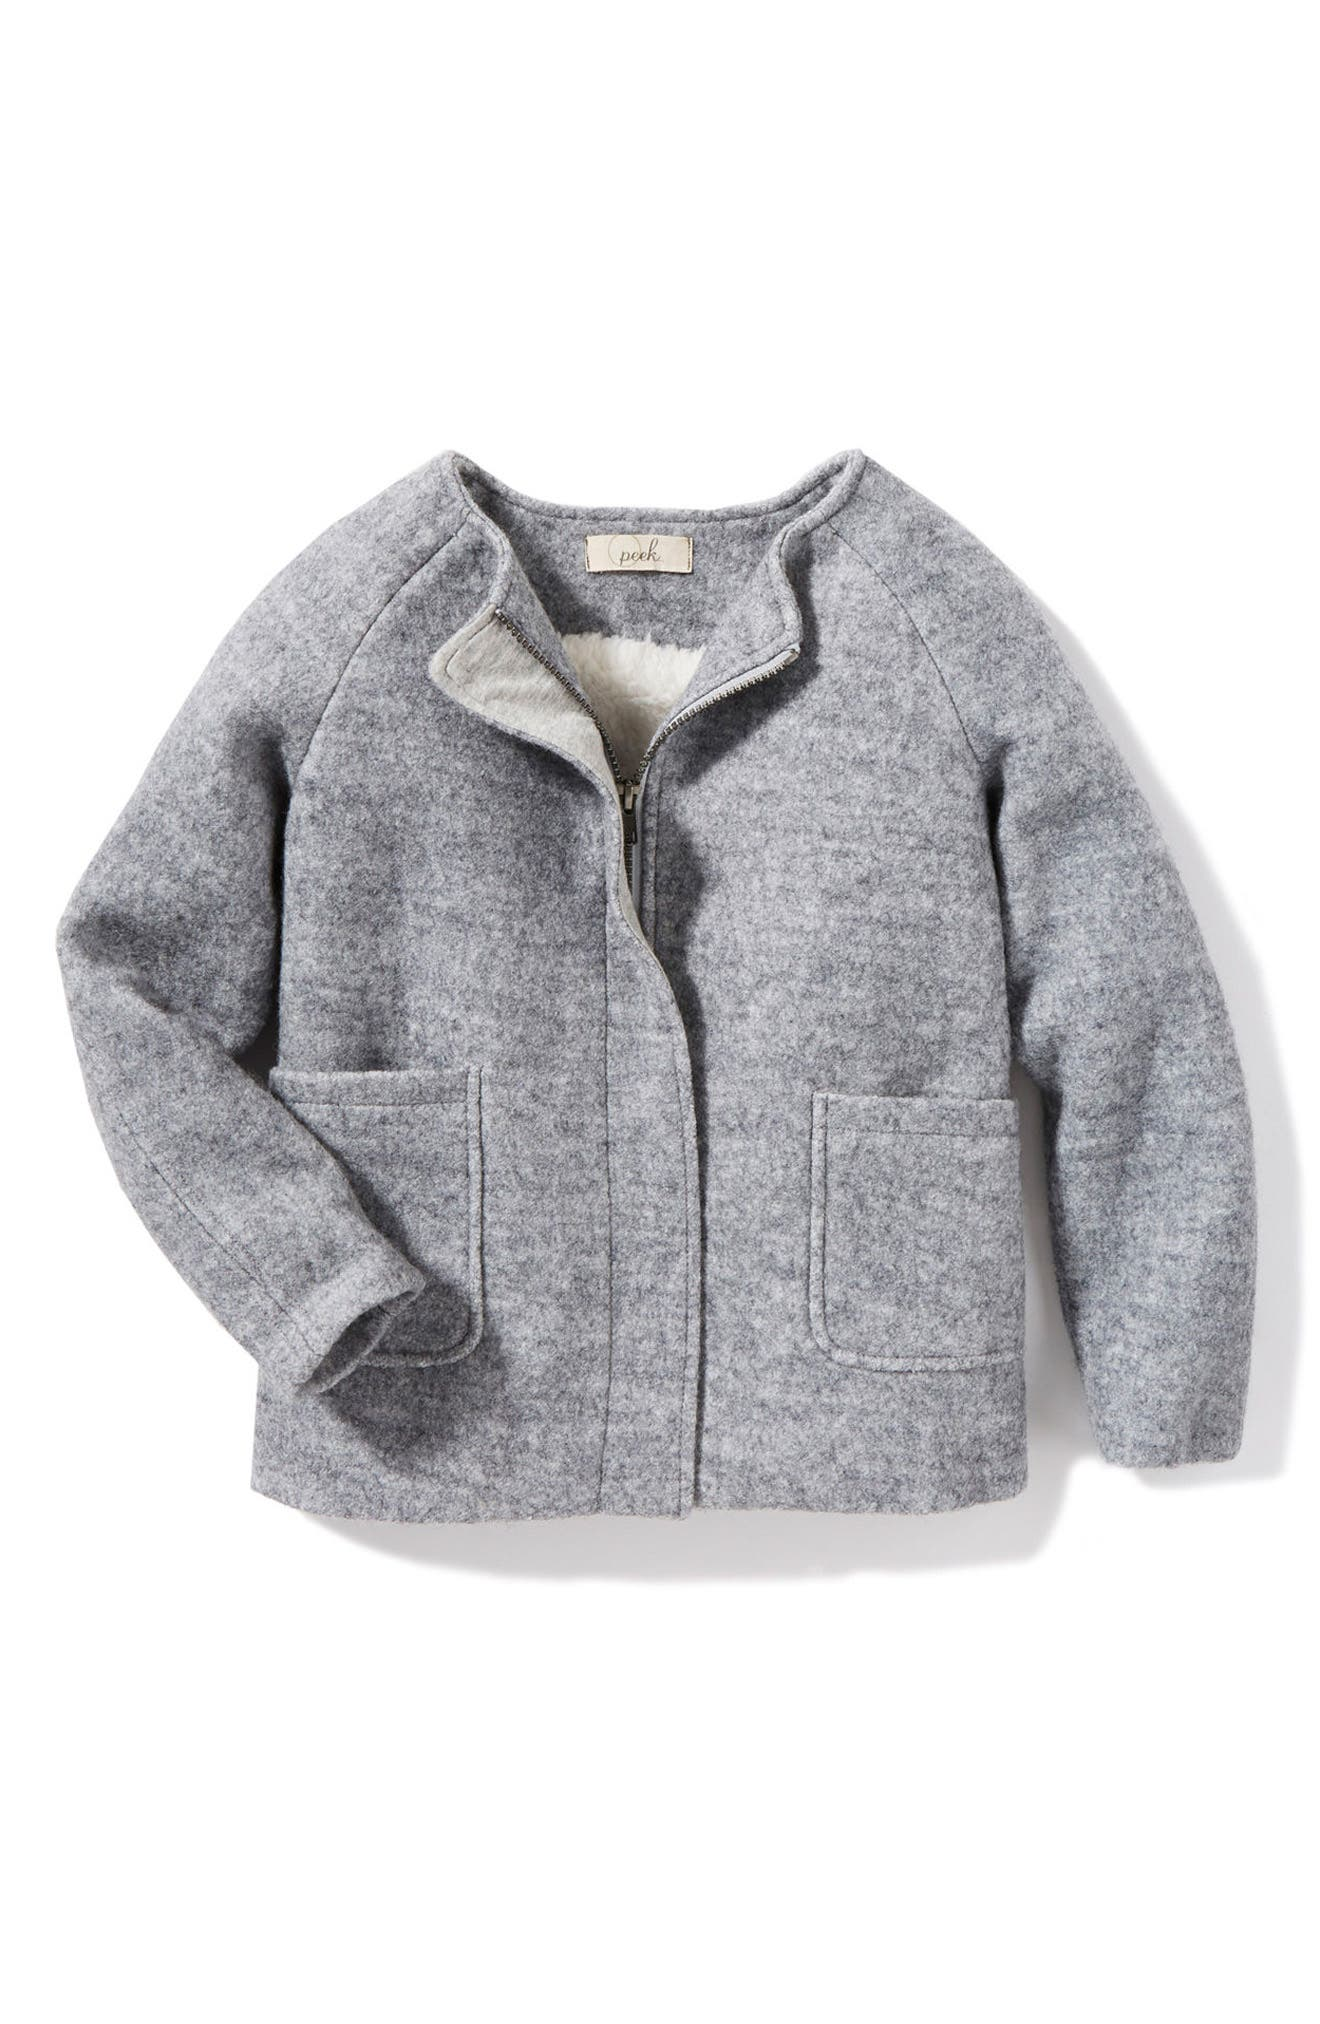 Alternate Image 1 Selected - Peek Glenda Fleece Jacket (Toddler Girls, Little Girls & Big Girls)